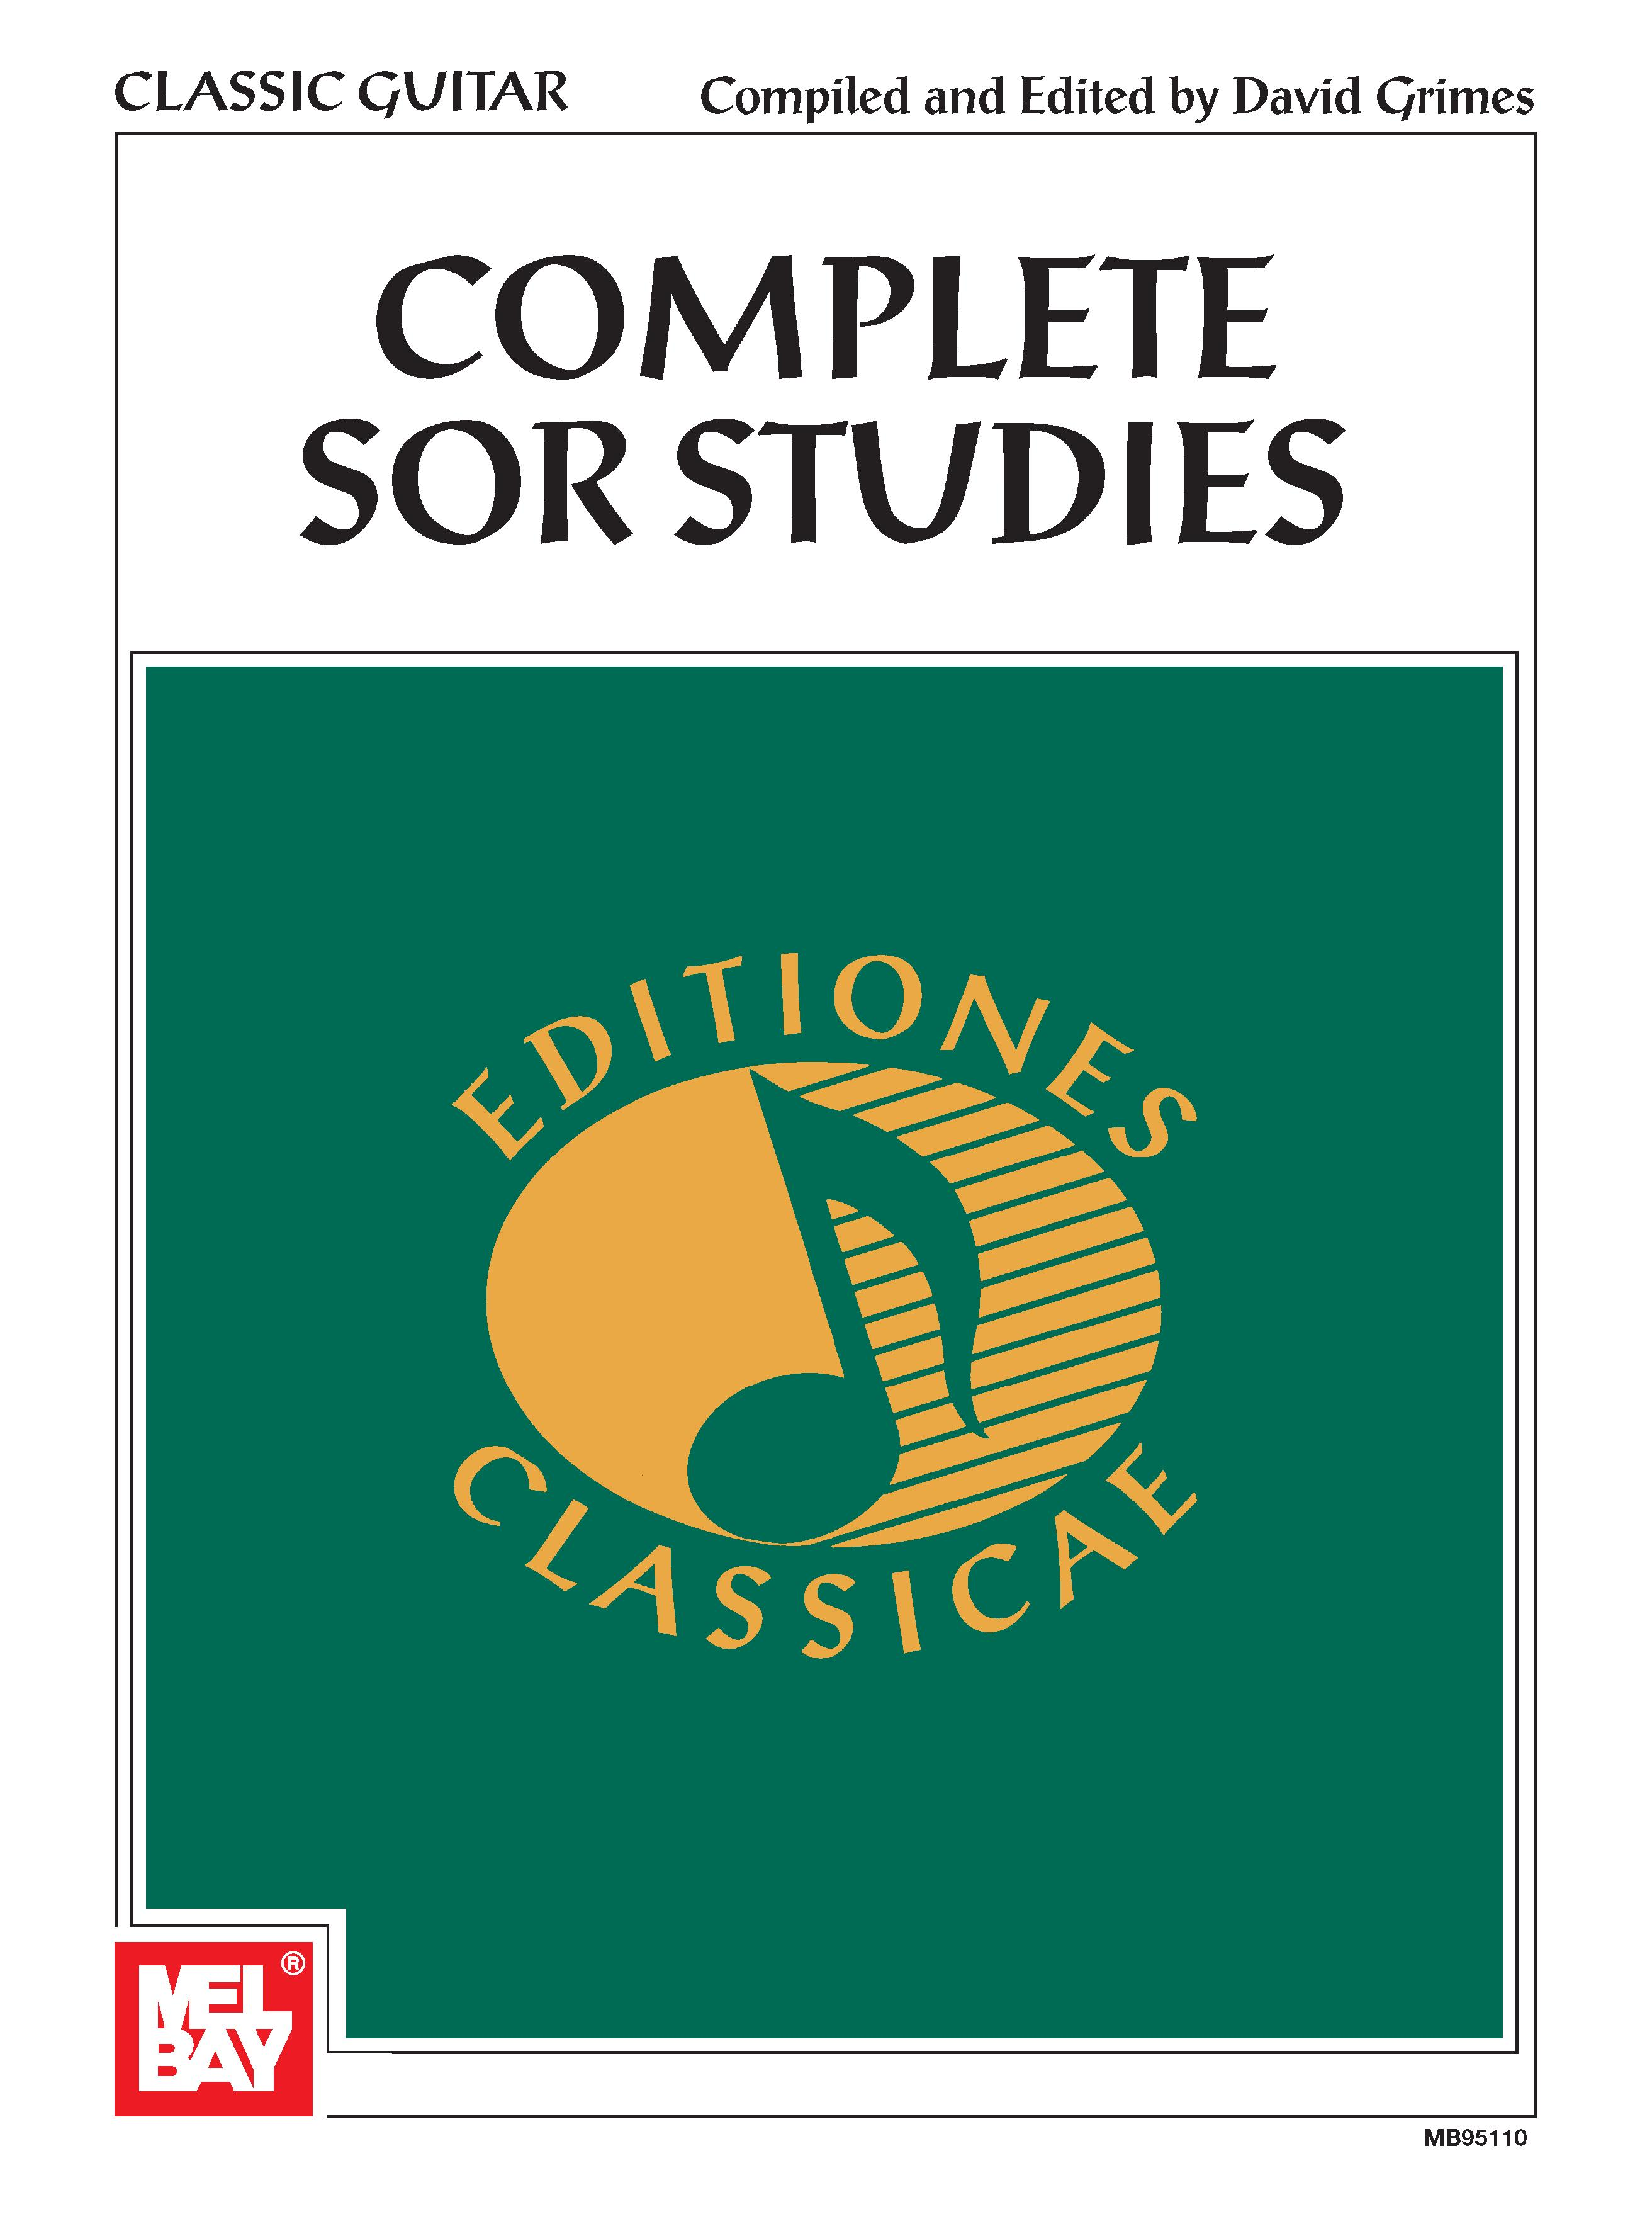 Mel Bay Presents Complete Sor Studies by Mel Bay Publications, Inc.